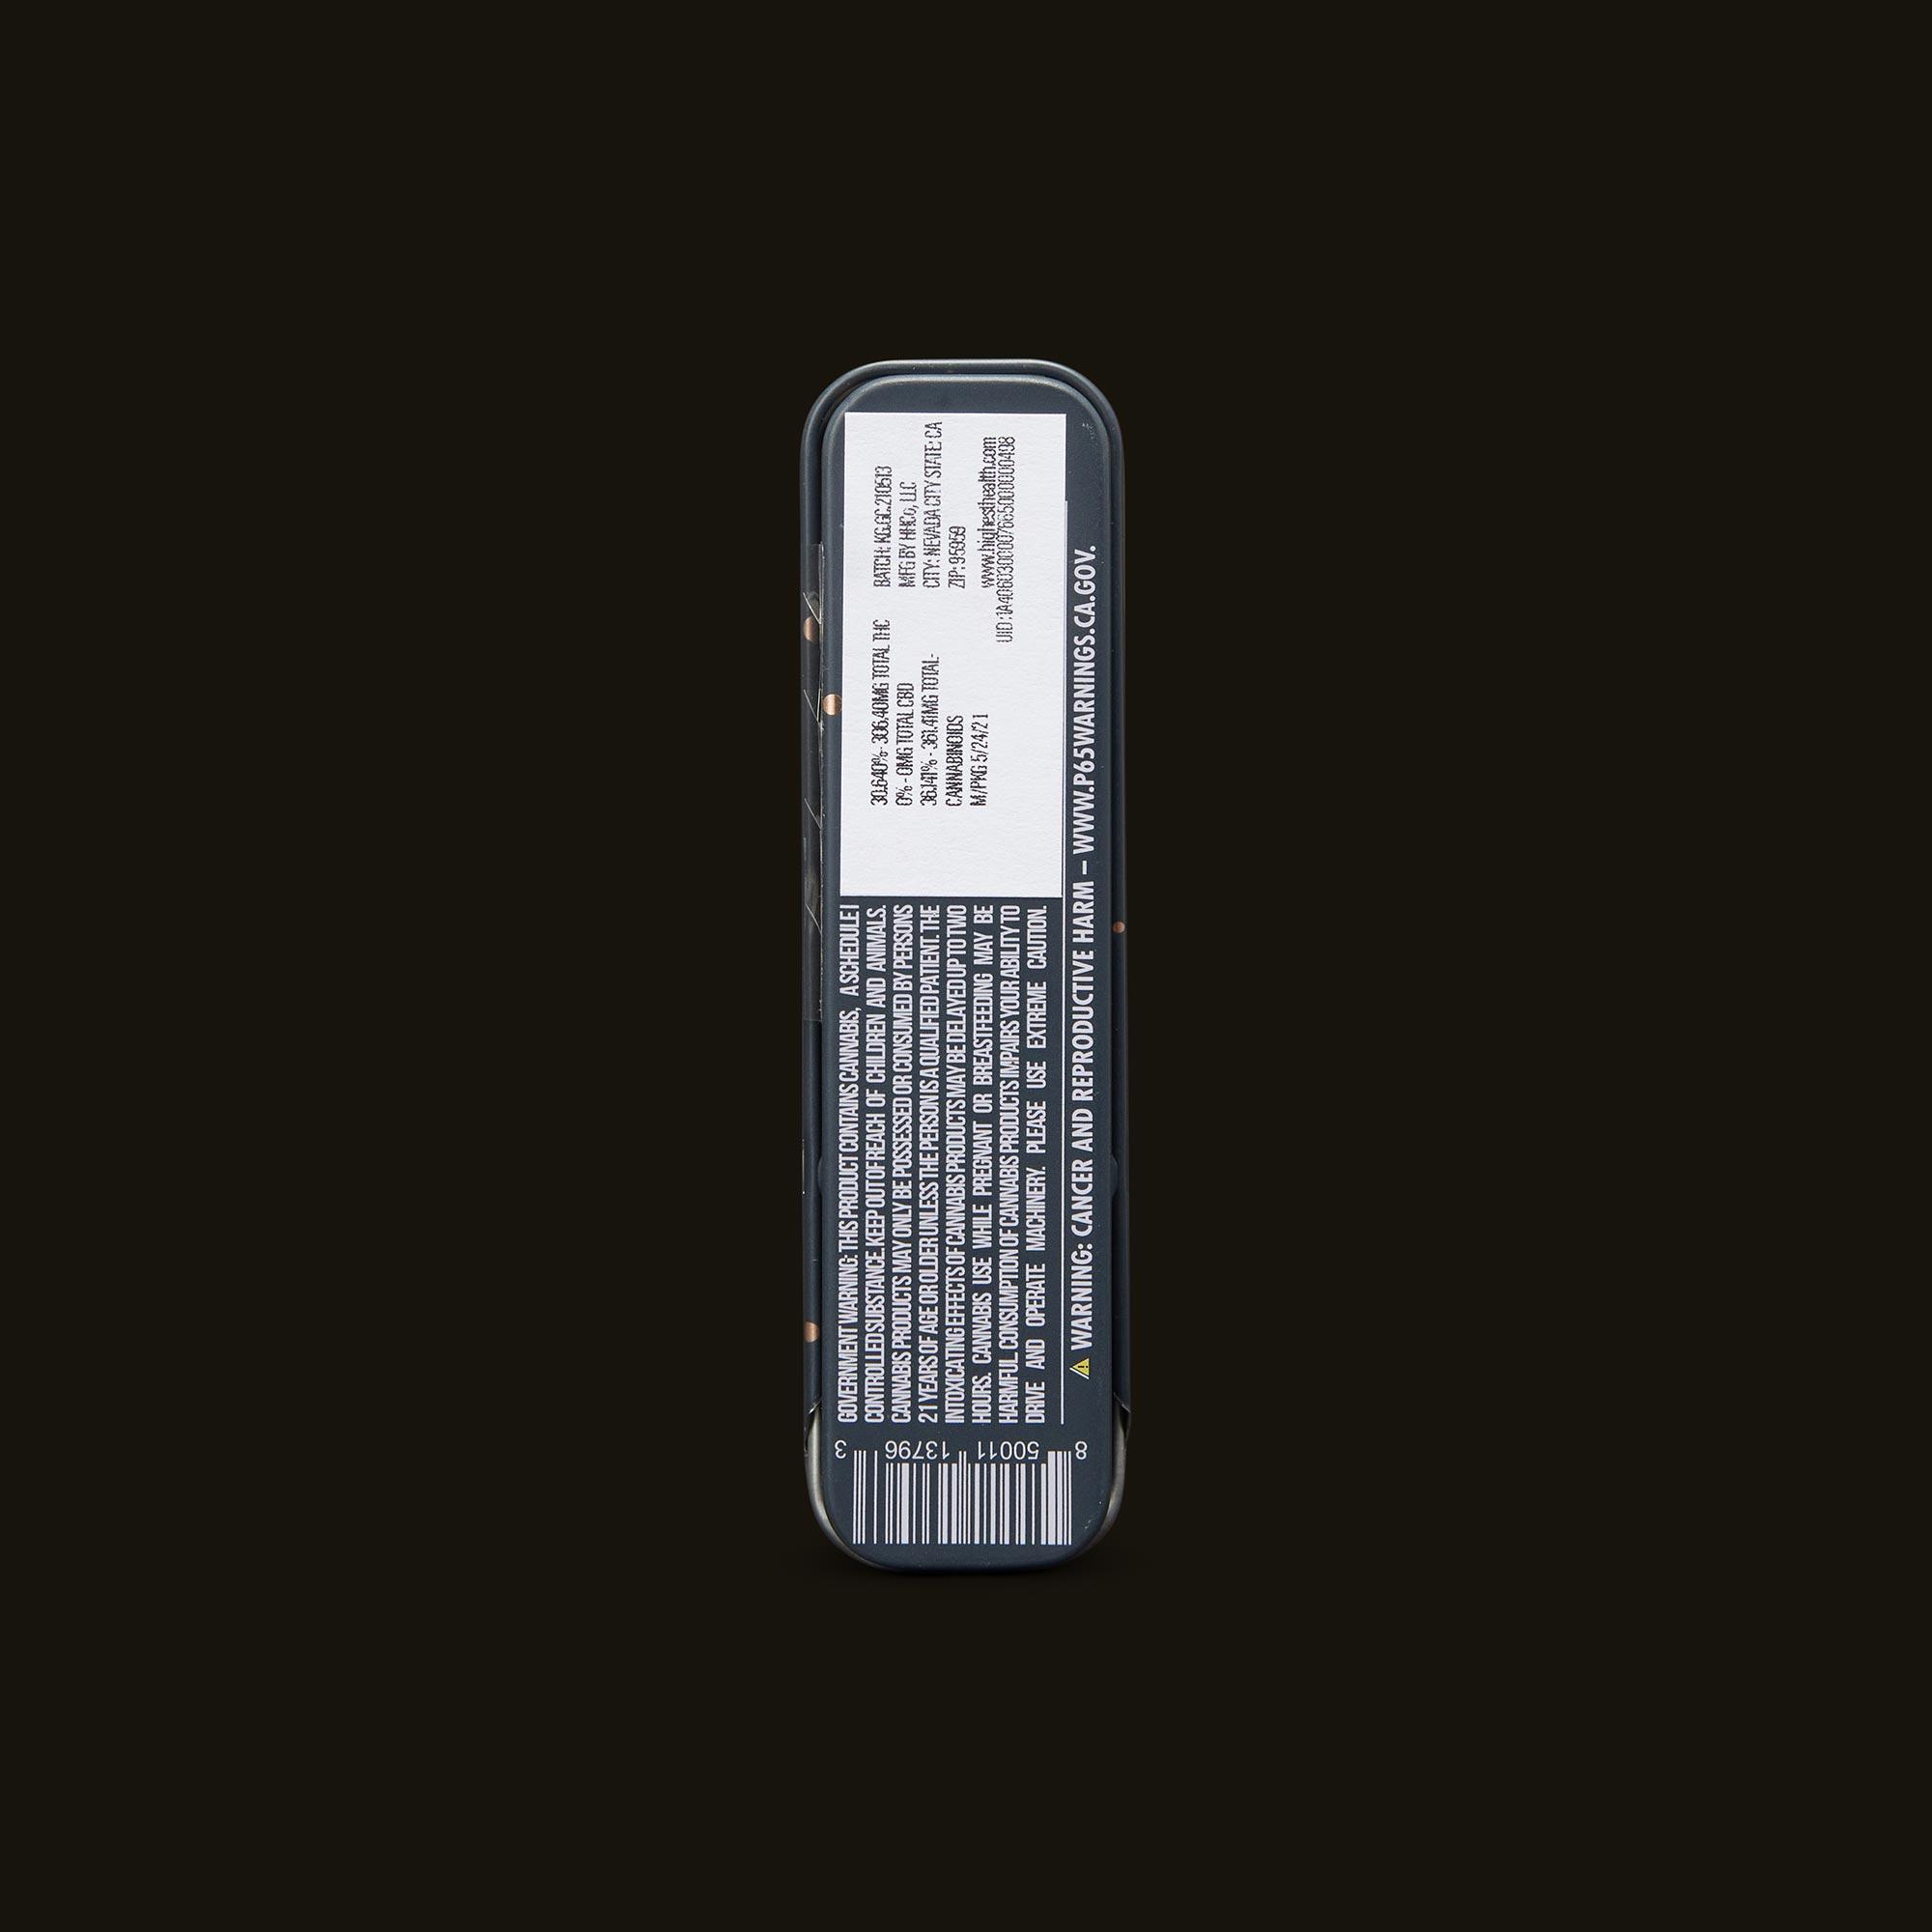 LEUNE Pre-Rolls - Calibre Hash Infused Pre-Rolls